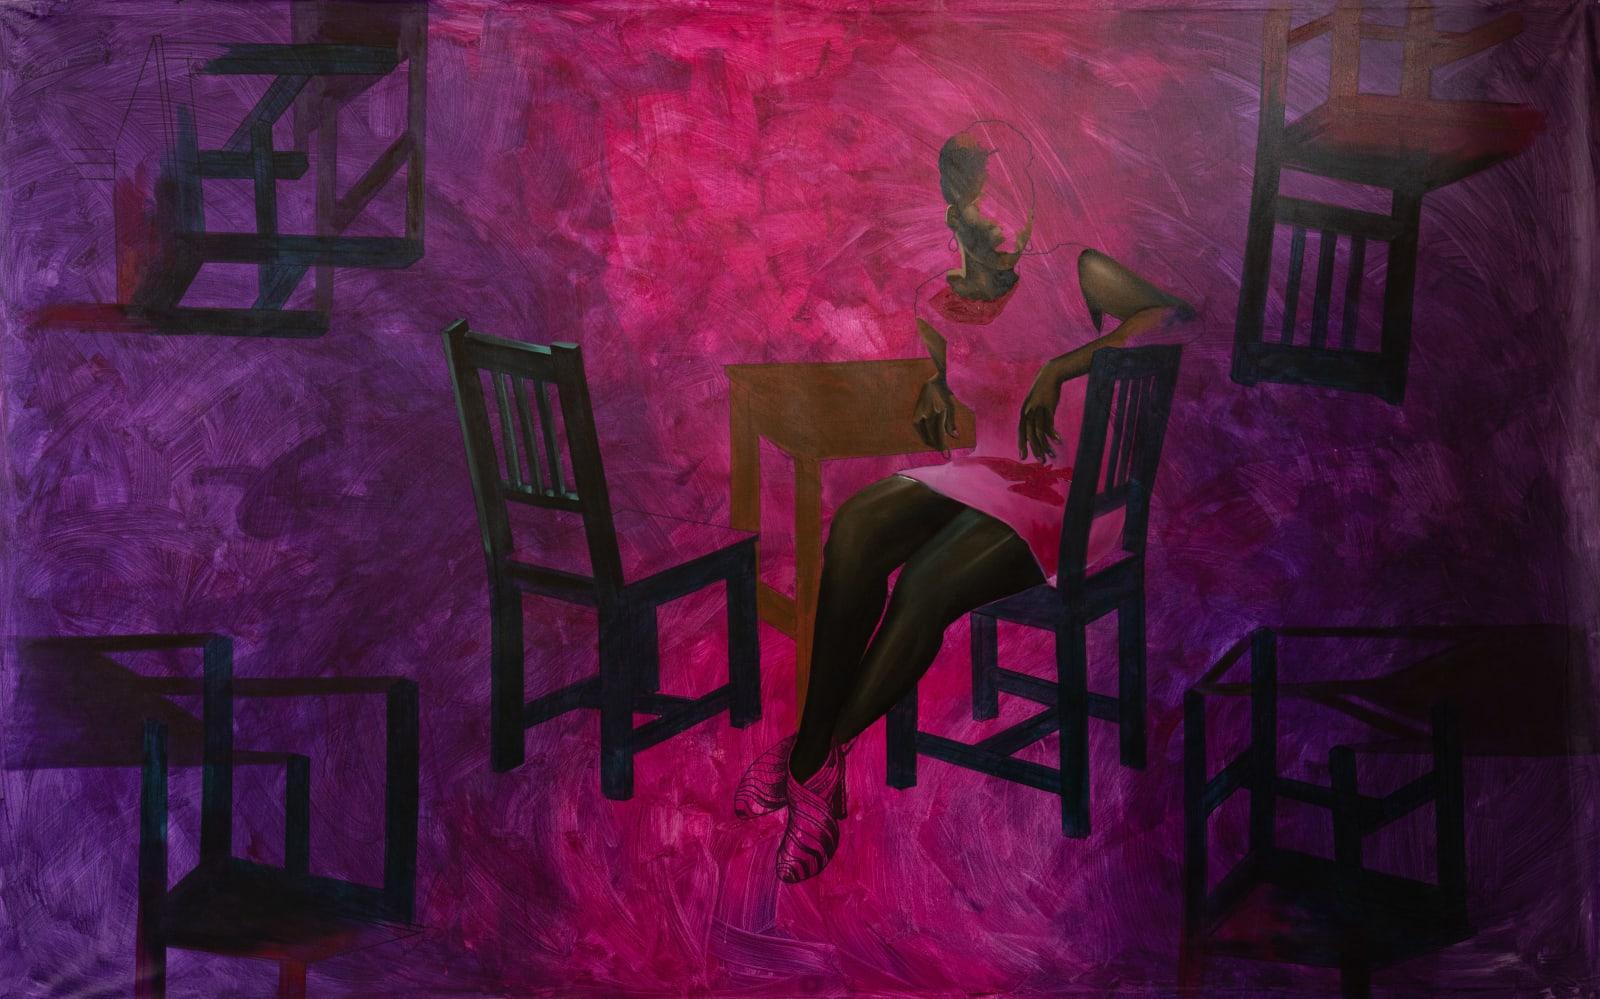 Joshua Oheneba-Takyi, A Seat At The Table, 2021